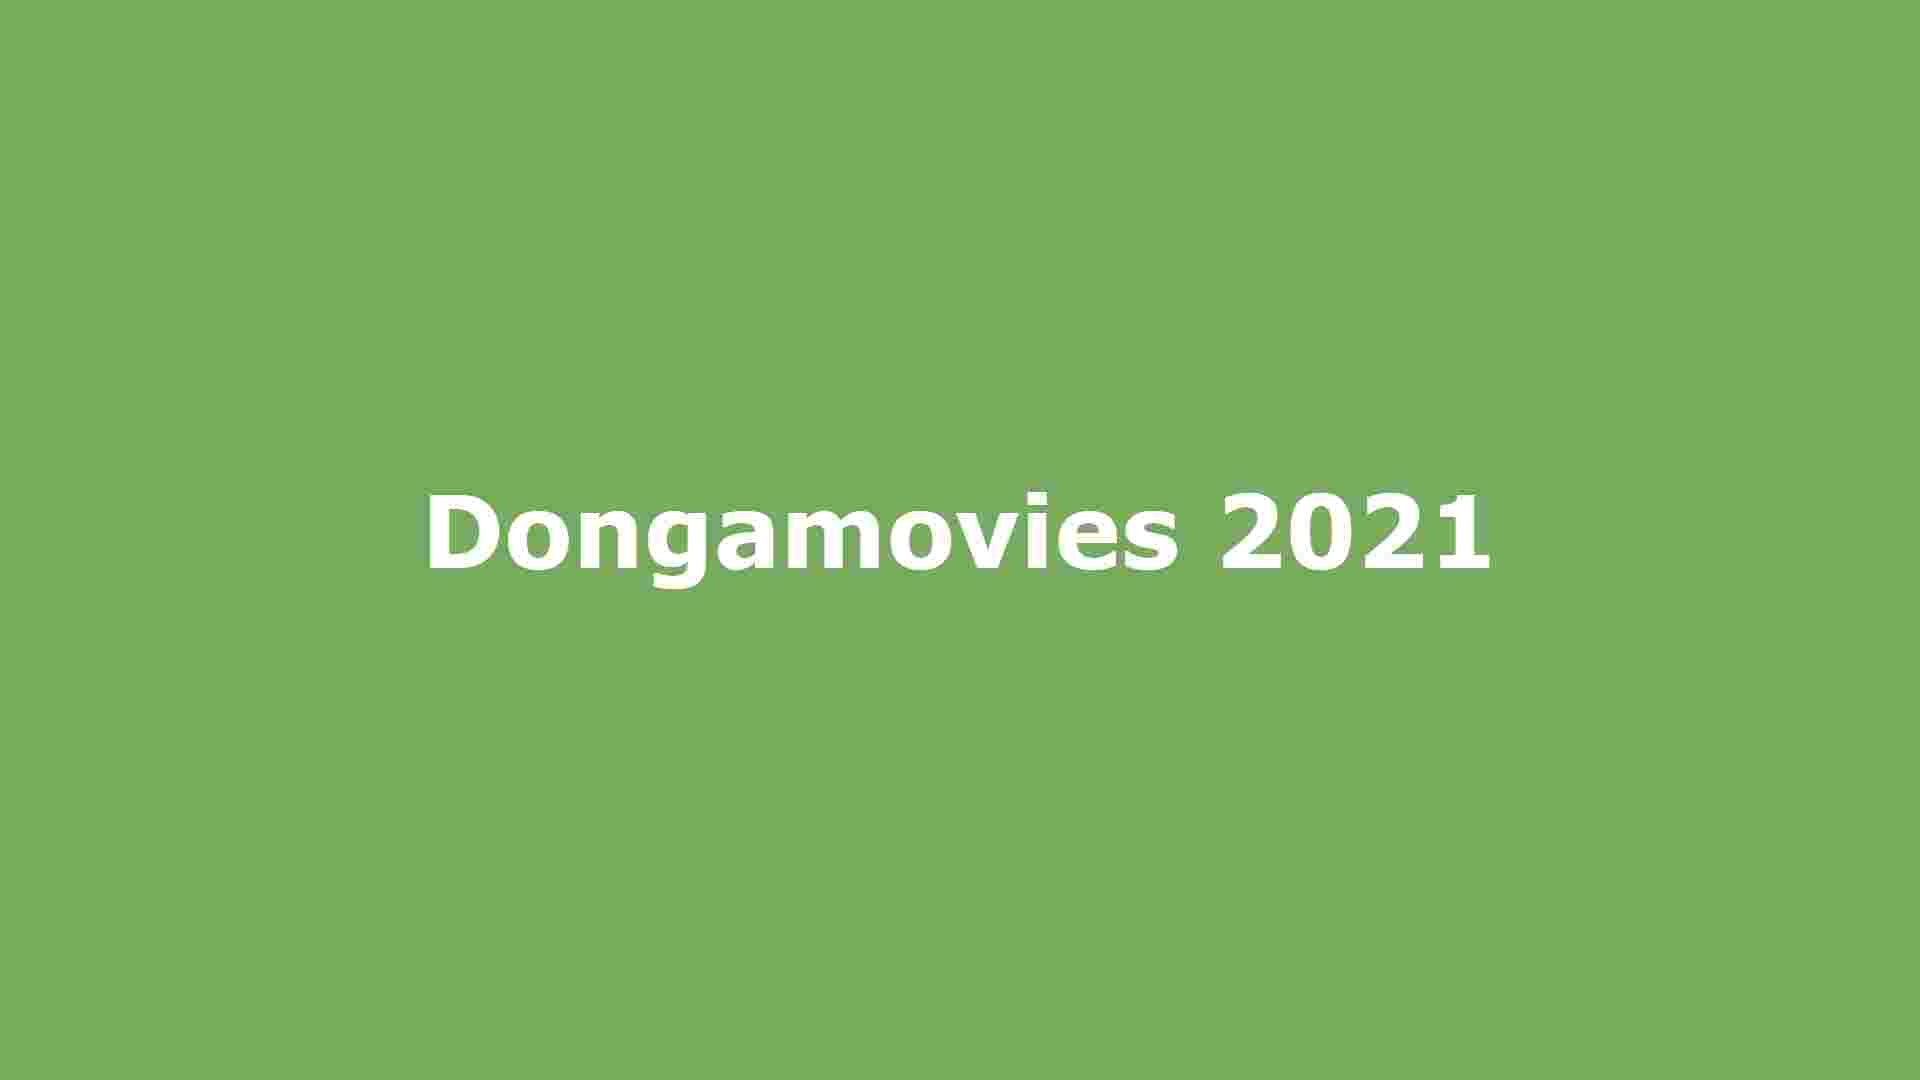 Download new jio 2021 rockers movie telugu apps.inn.org 2021